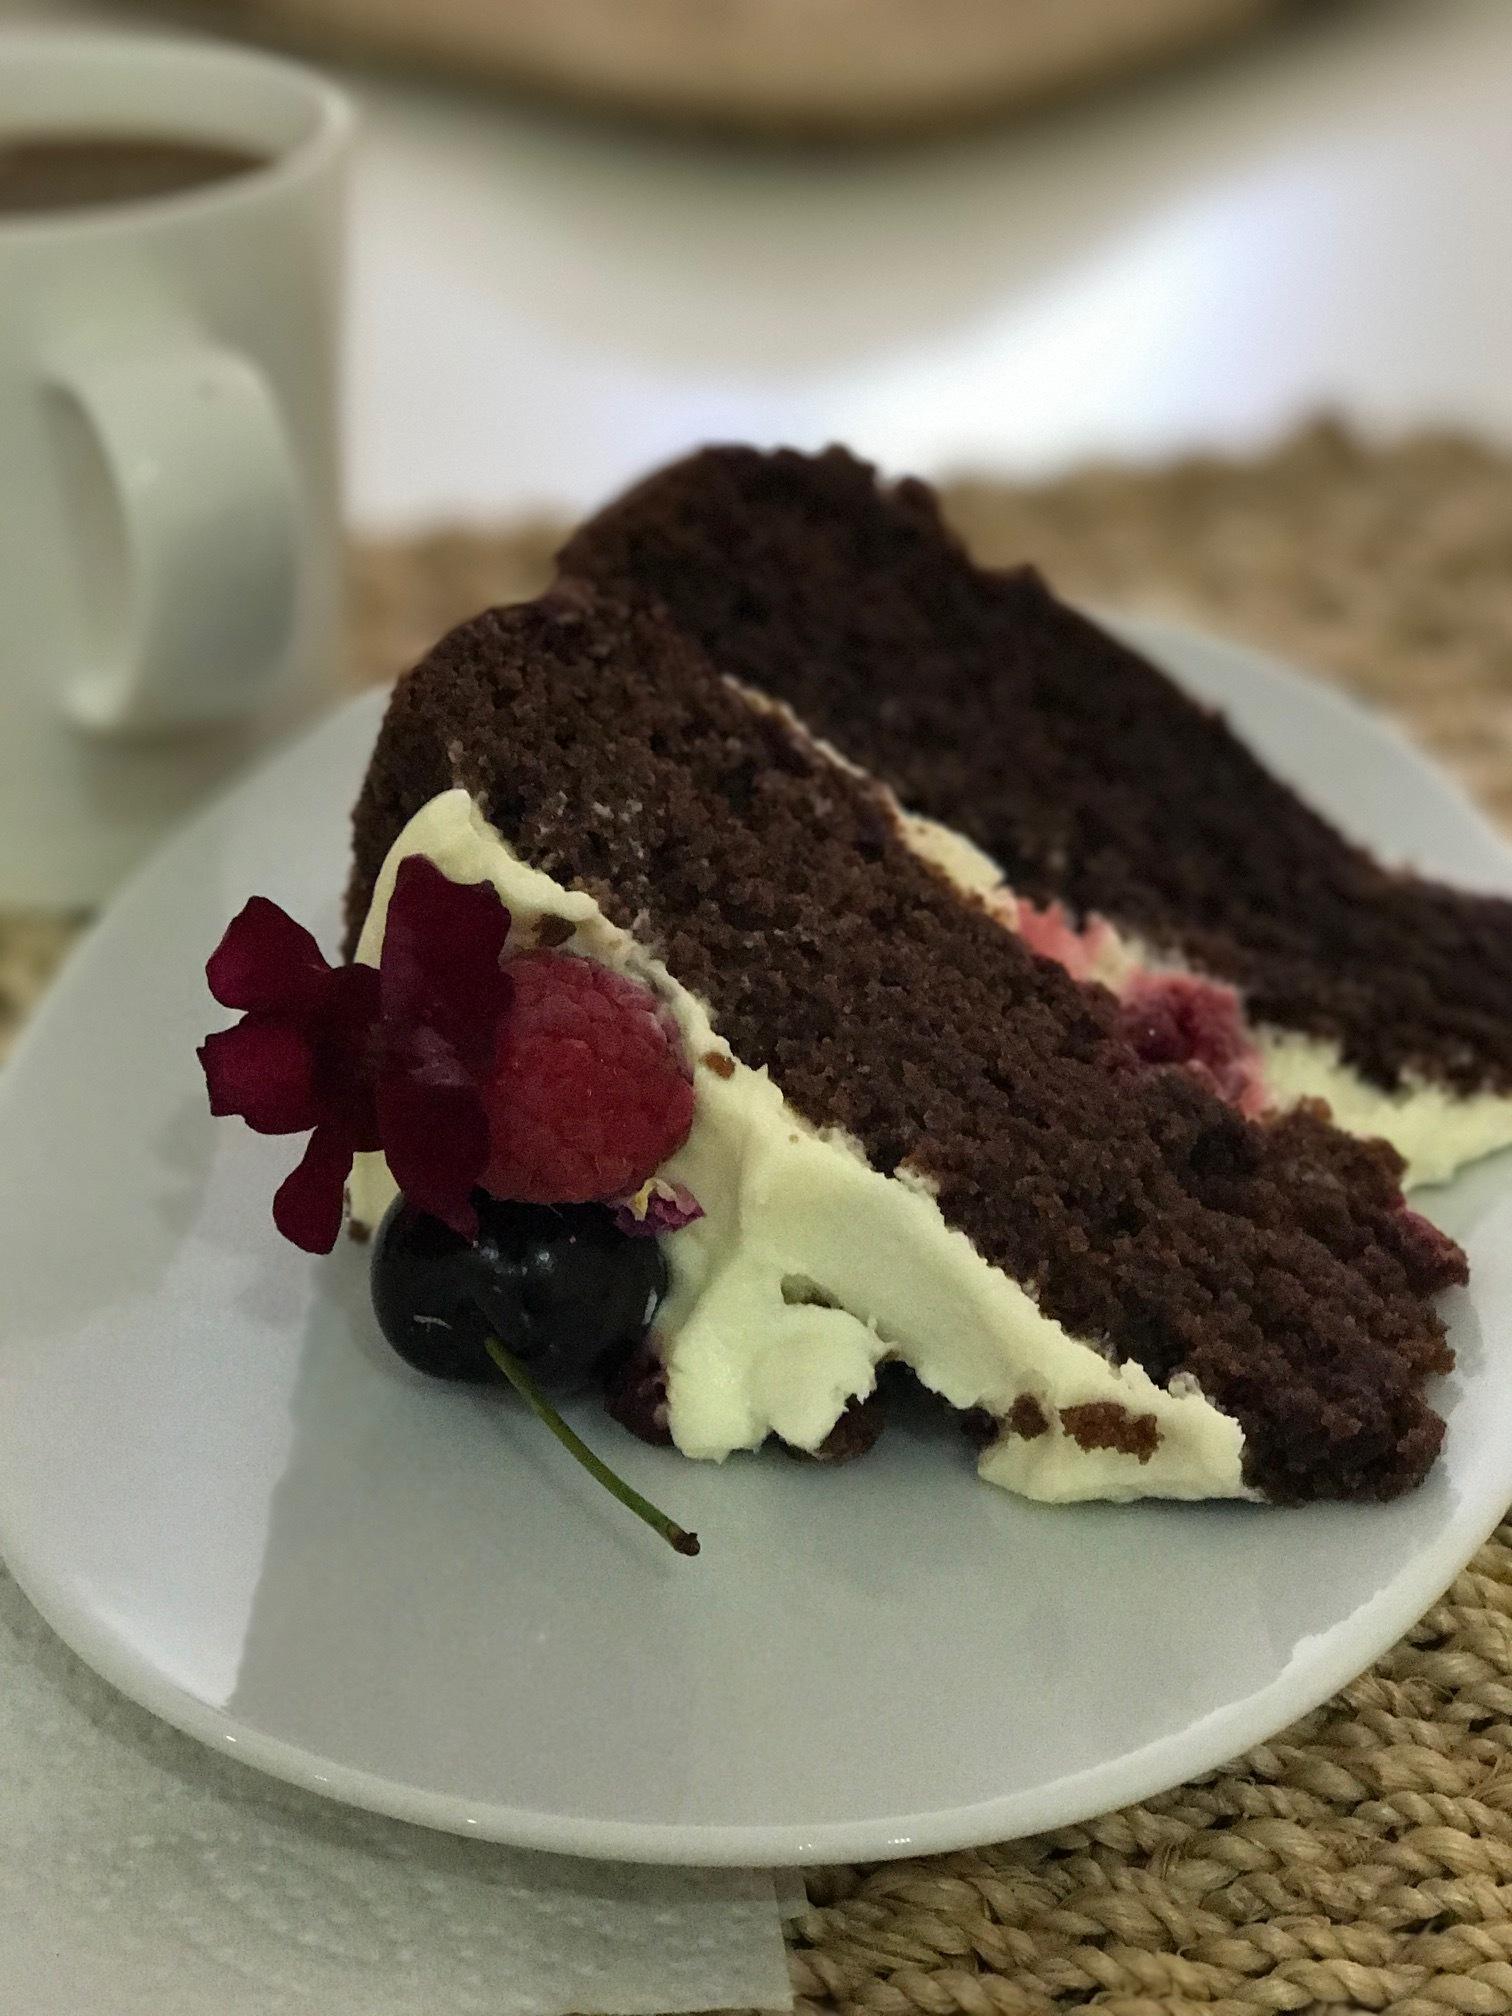 Chocolate raspberry cake from Barefoot